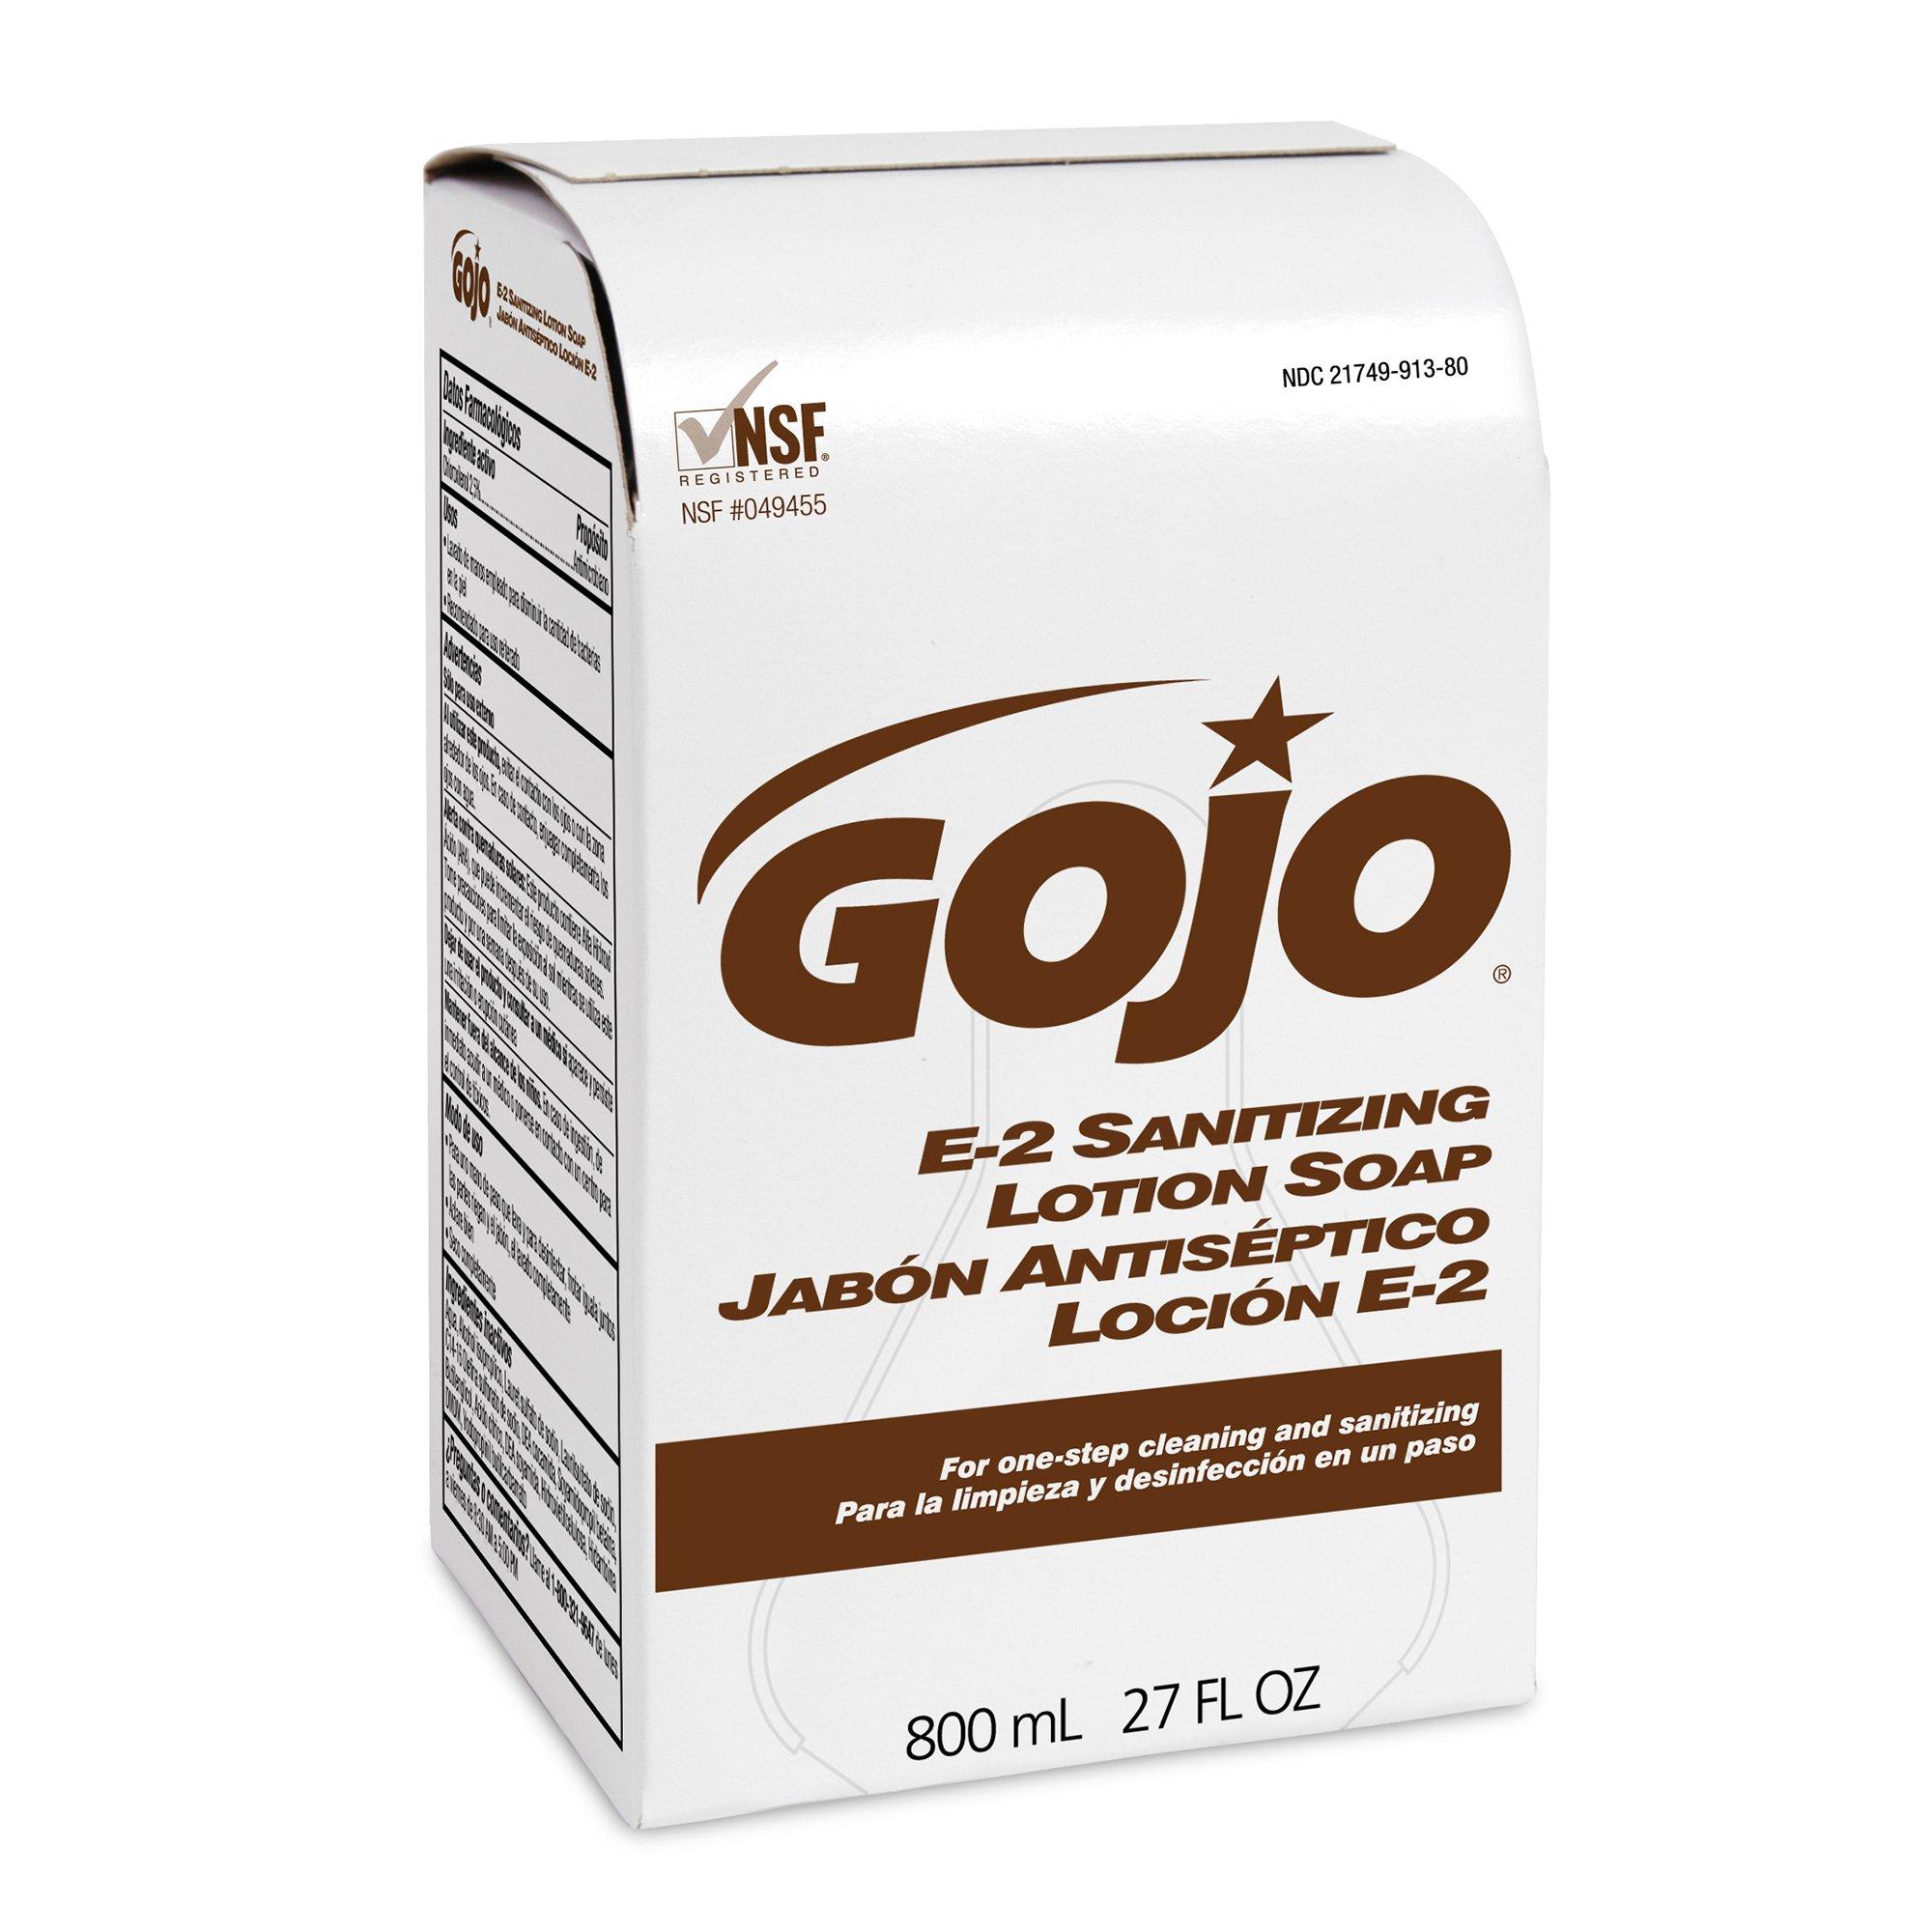 GOJO 800 Series E2 Sanitizing Lotion Soap, 800 mL Sanitizing Soap Refill for 800 Series Bag-in-Box Push-Style Dispenser (Case of 12) - 9132-12 by Gojo (Image #1)